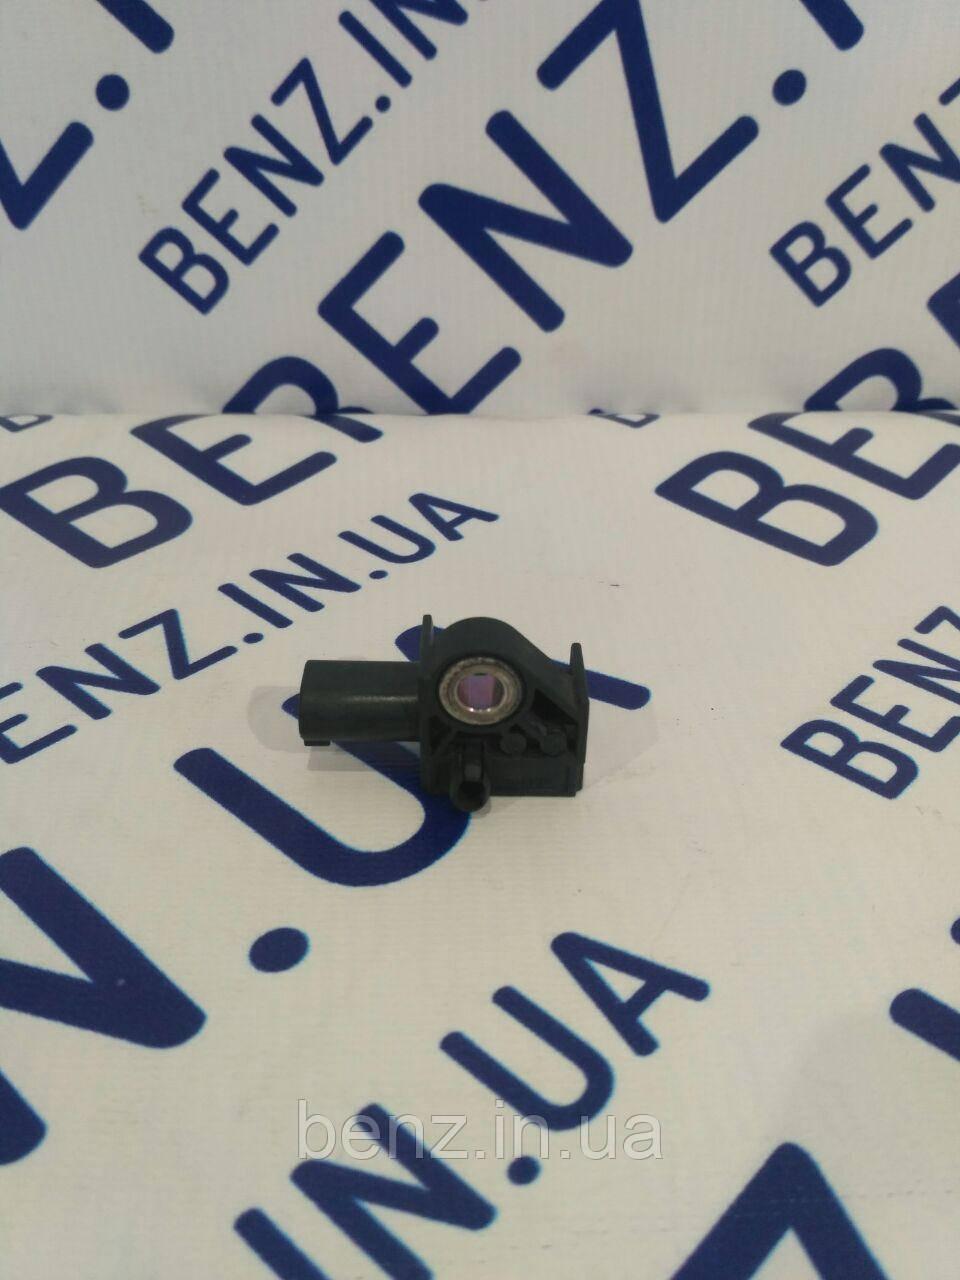 Датчик удара подушек безопасности спереди Mercedes W212/W204/C207/X204 A1729056000